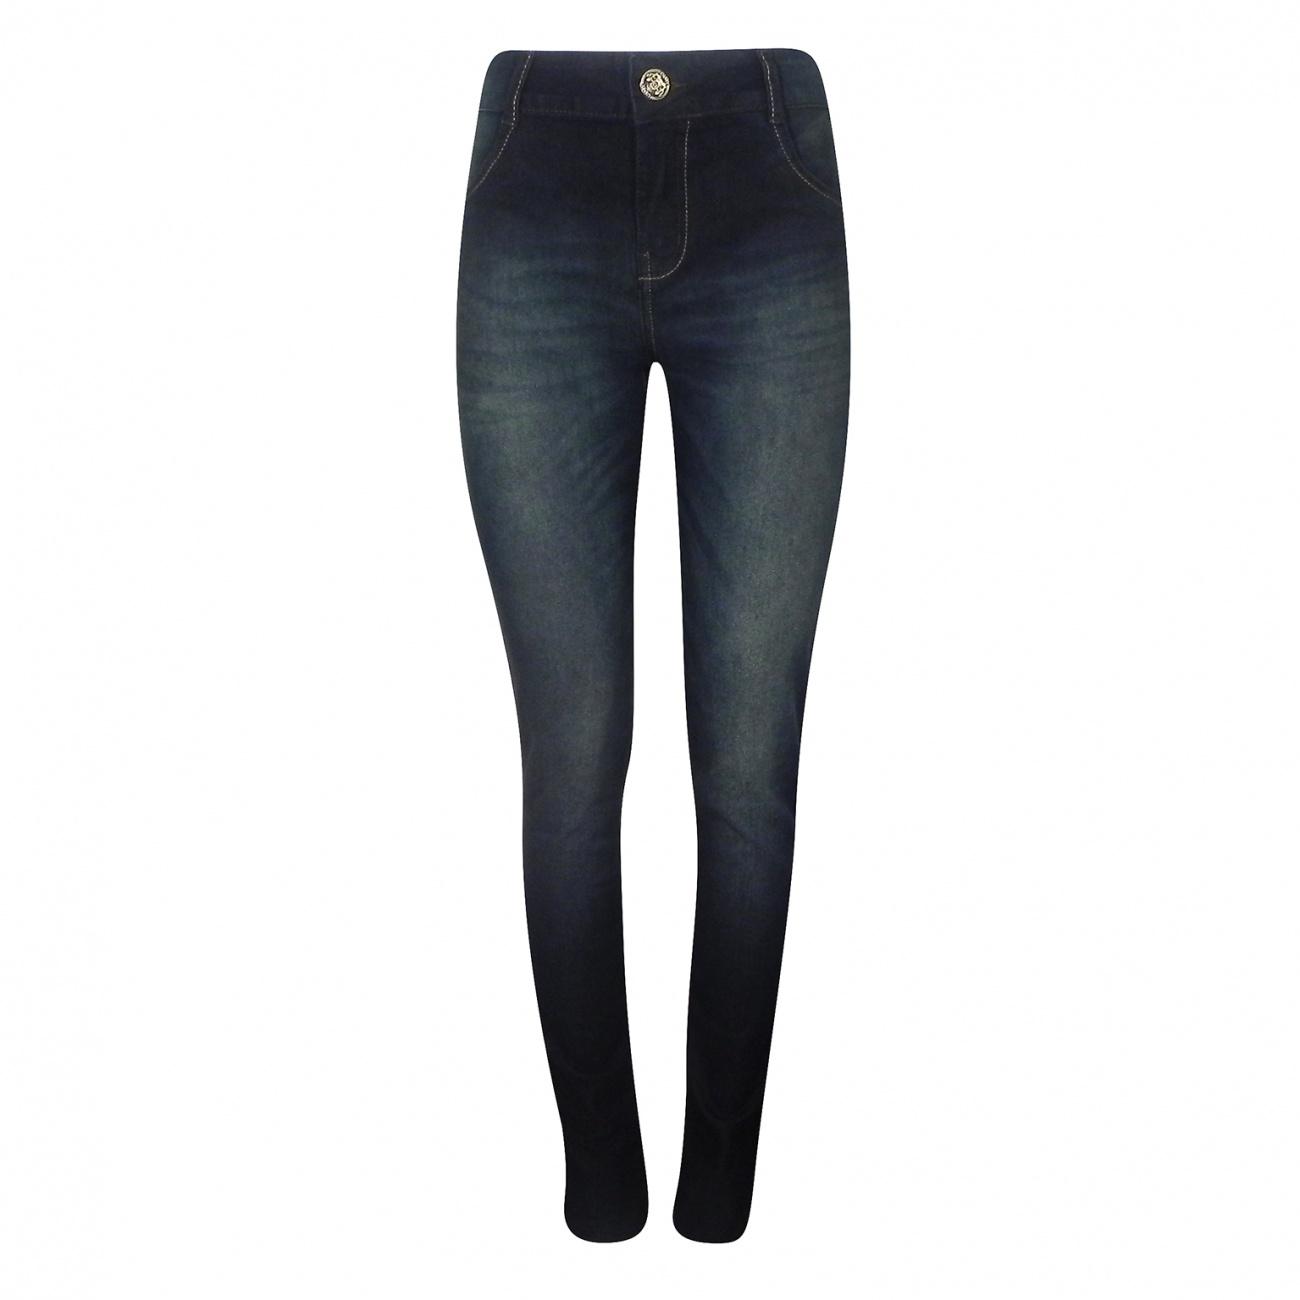 364c70773 Calça Jeans Selena Super Skinny Dimy - Pole Modas